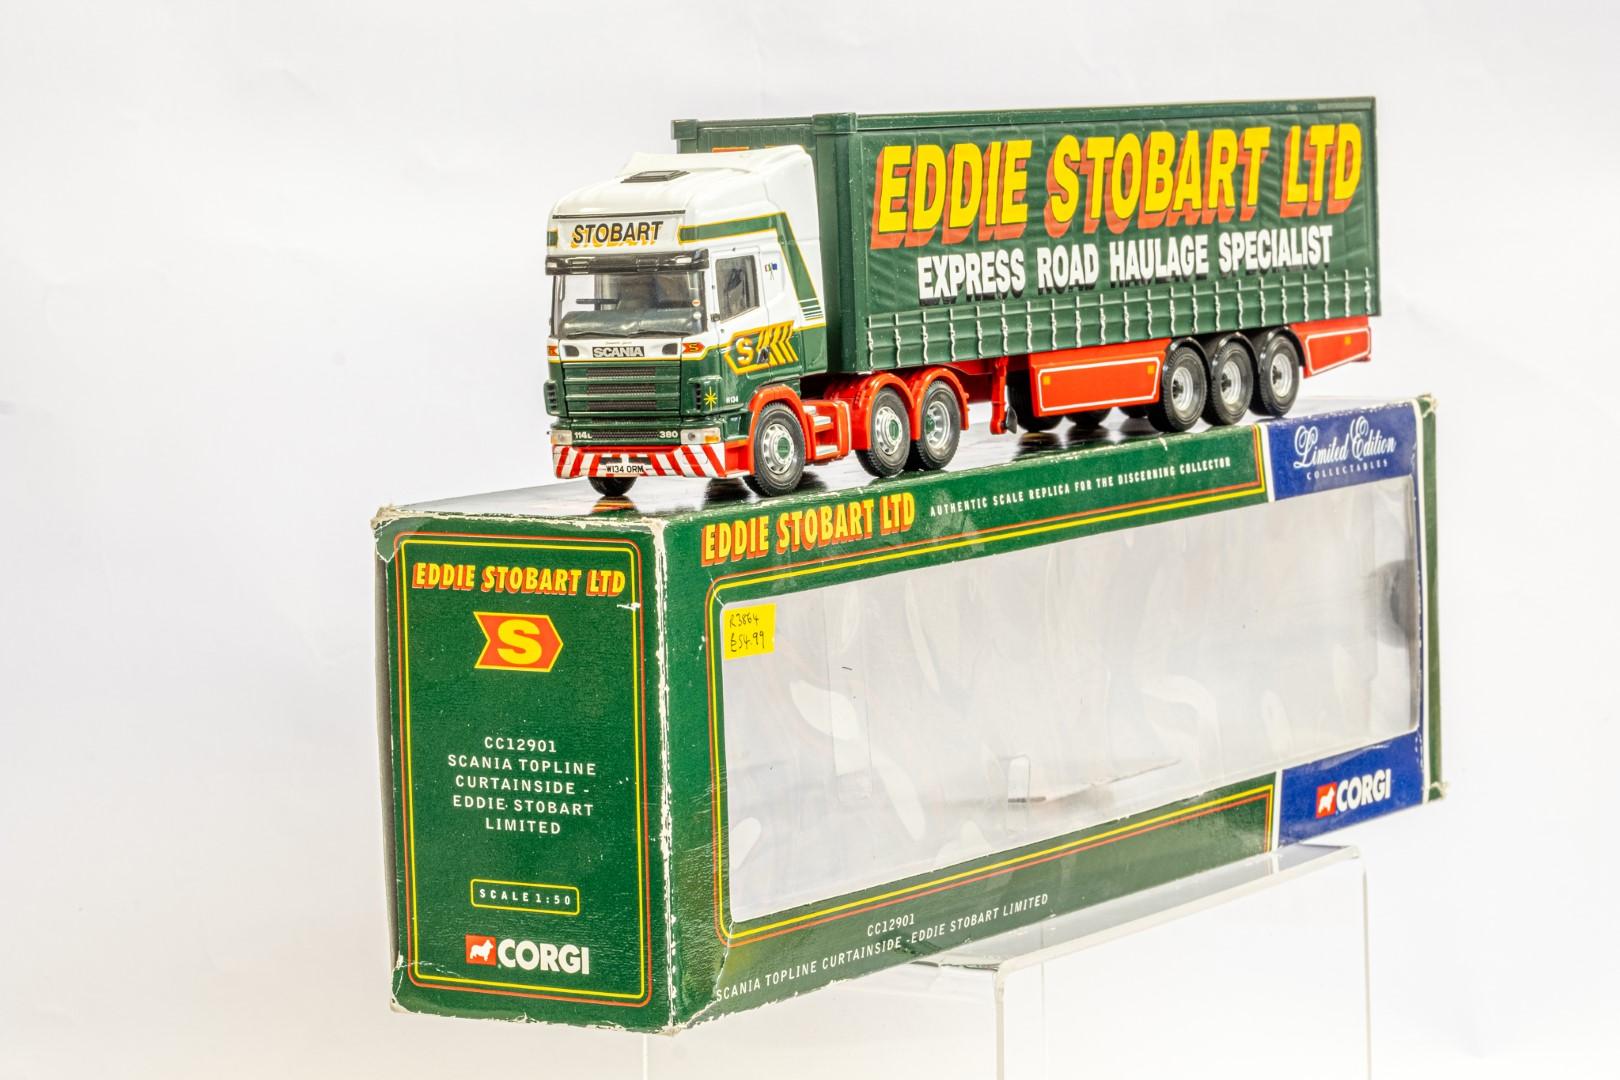 Corgi Scania Topline Curtainside Trailer - Eddie Stobart - Image 2 of 7